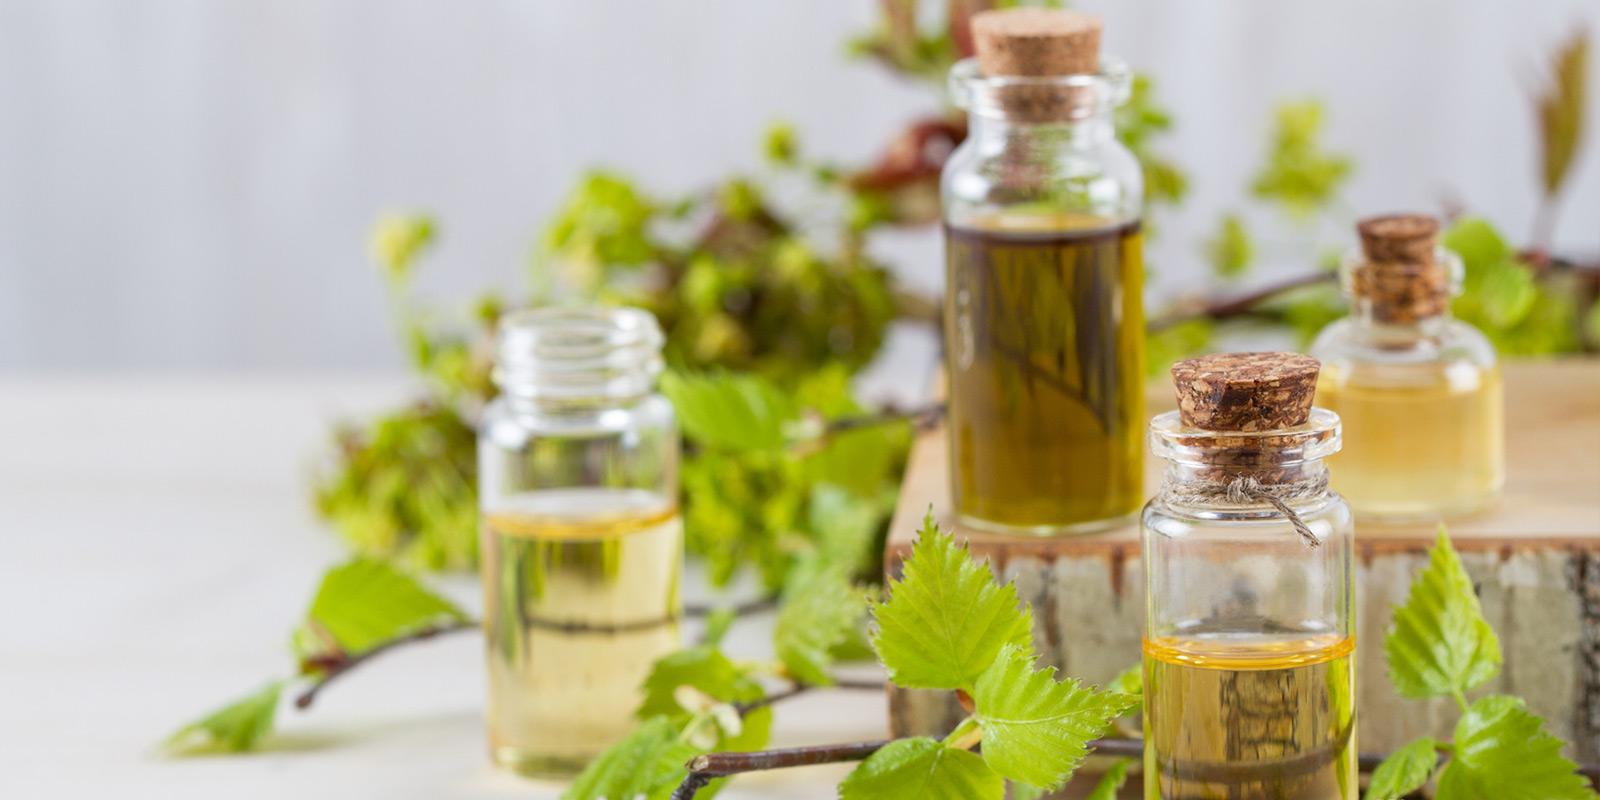 aromatherapie-huiles-essentielles-pharmacie-pk3-cholet